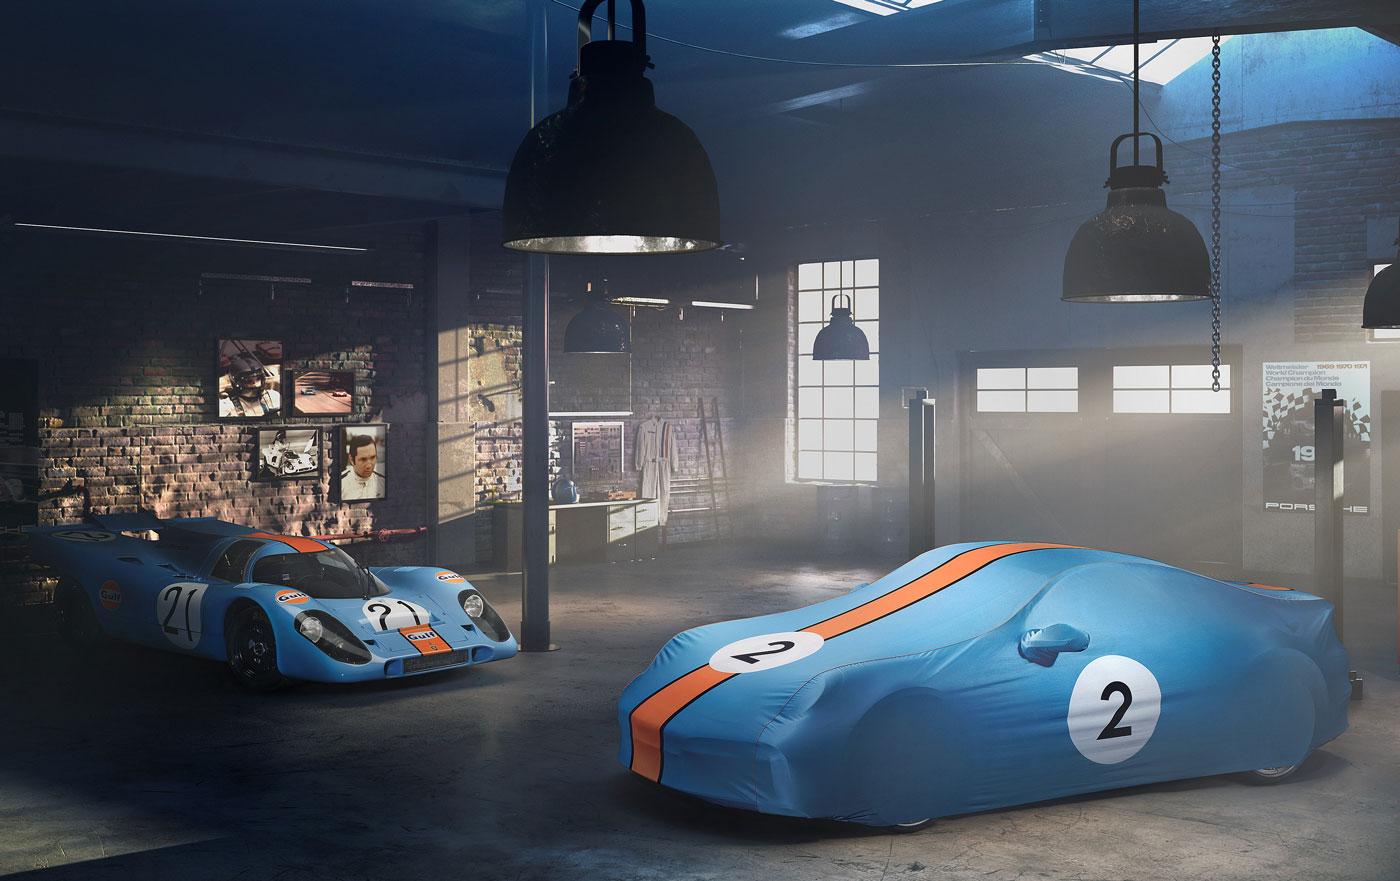 Porsche-992-Turbo-S-Pedro-Rodriguez-4